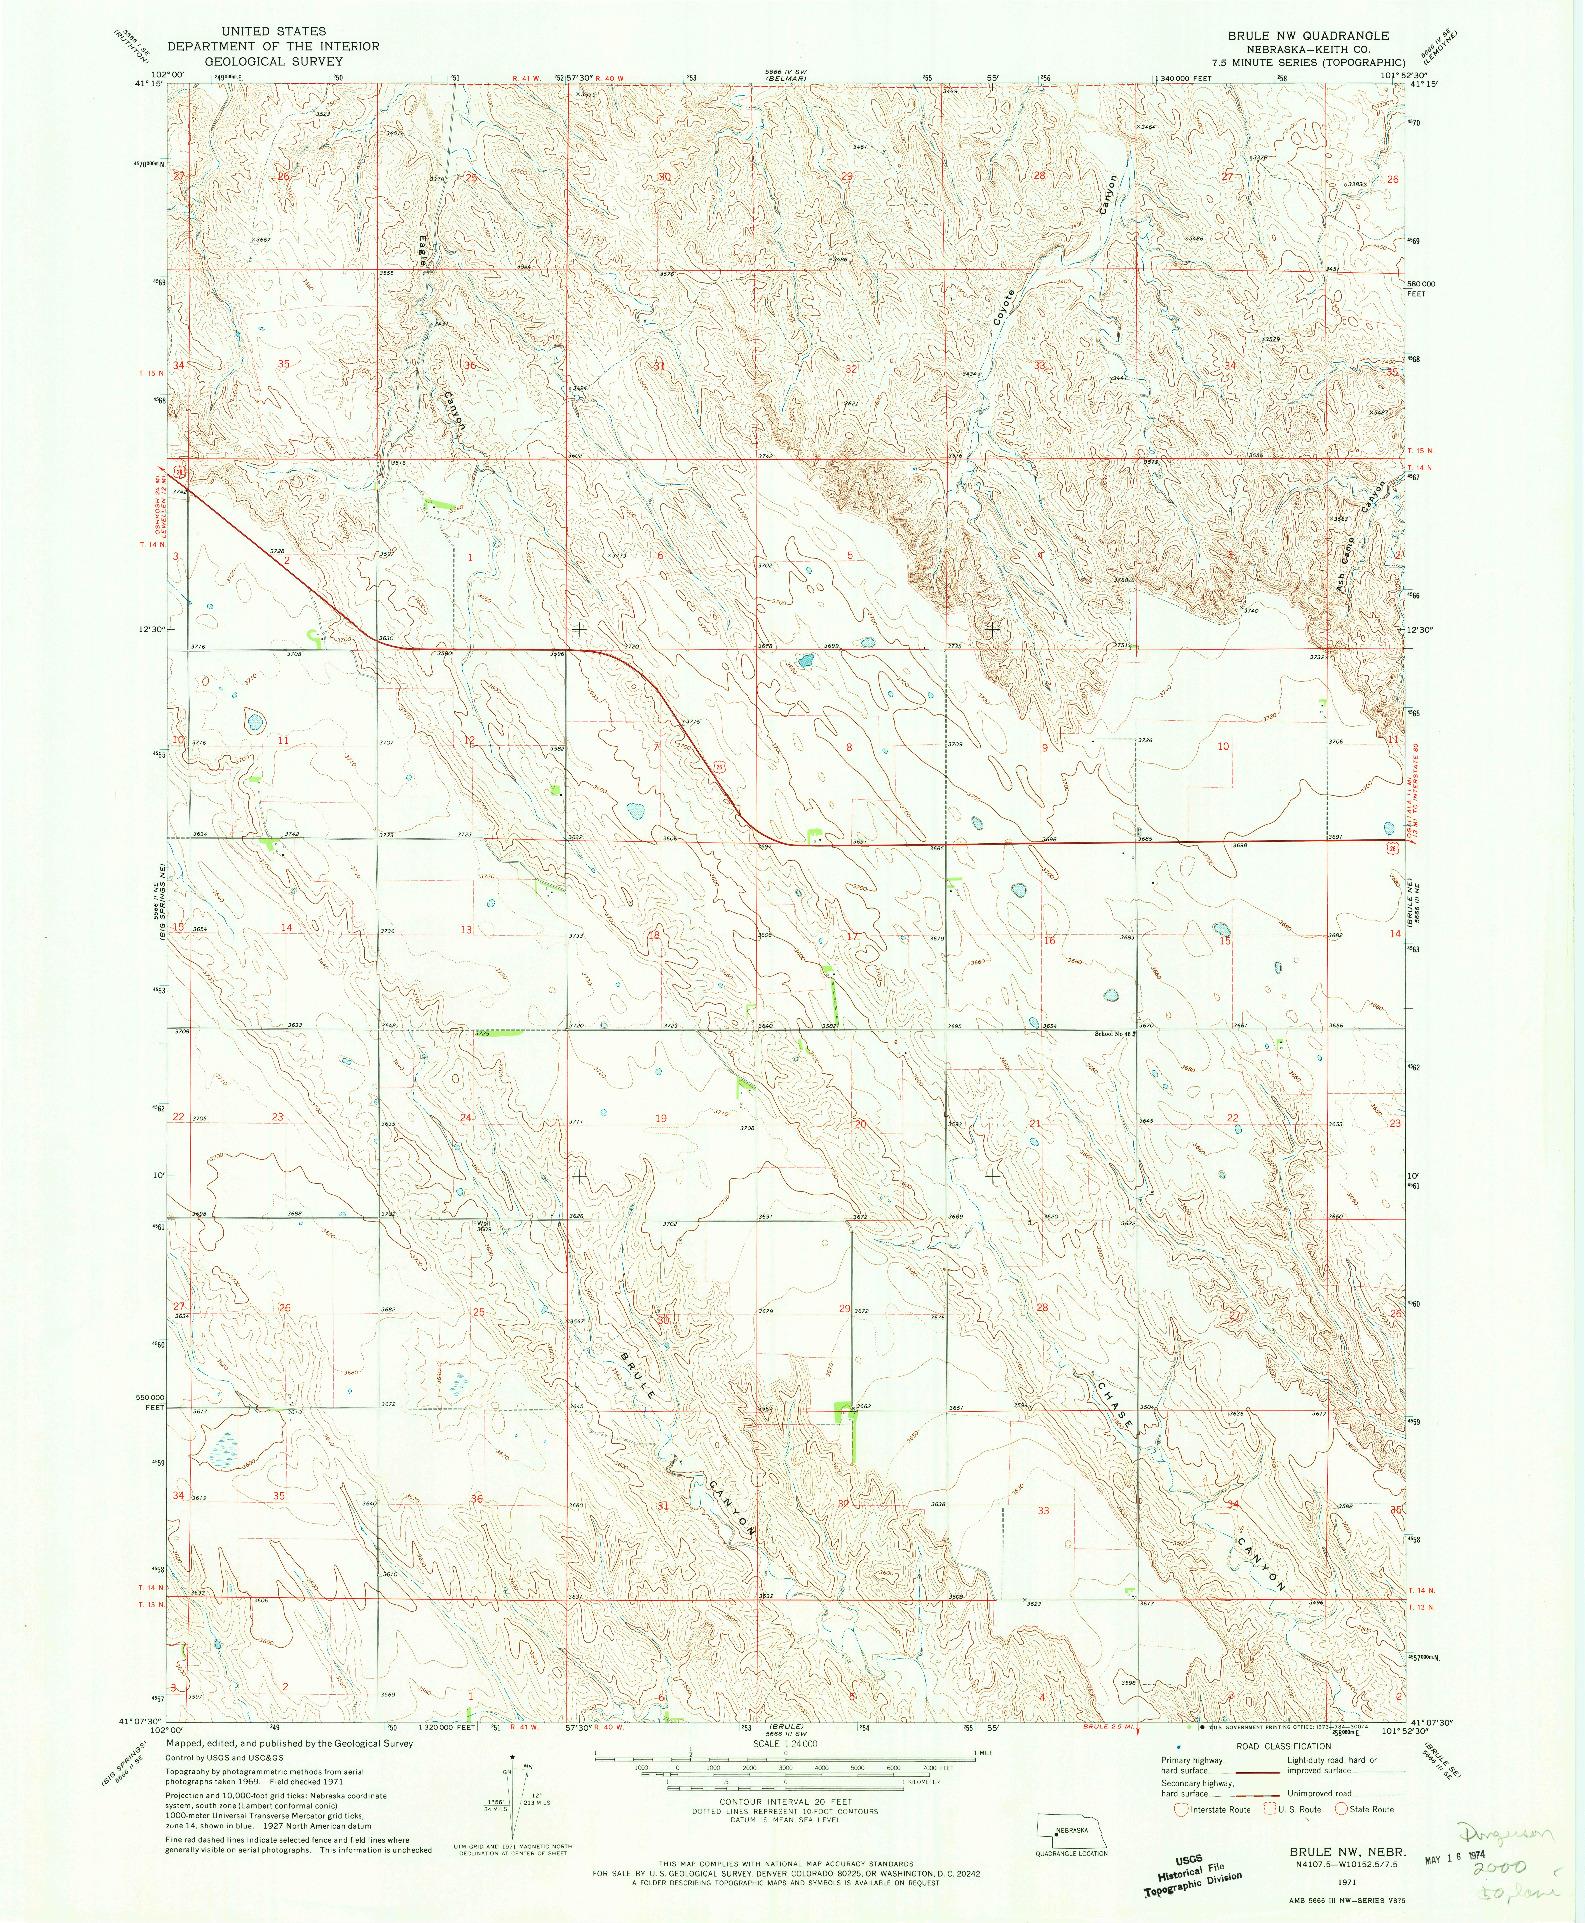 USGS 1:24000-SCALE QUADRANGLE FOR BRULE NW, NE 1971